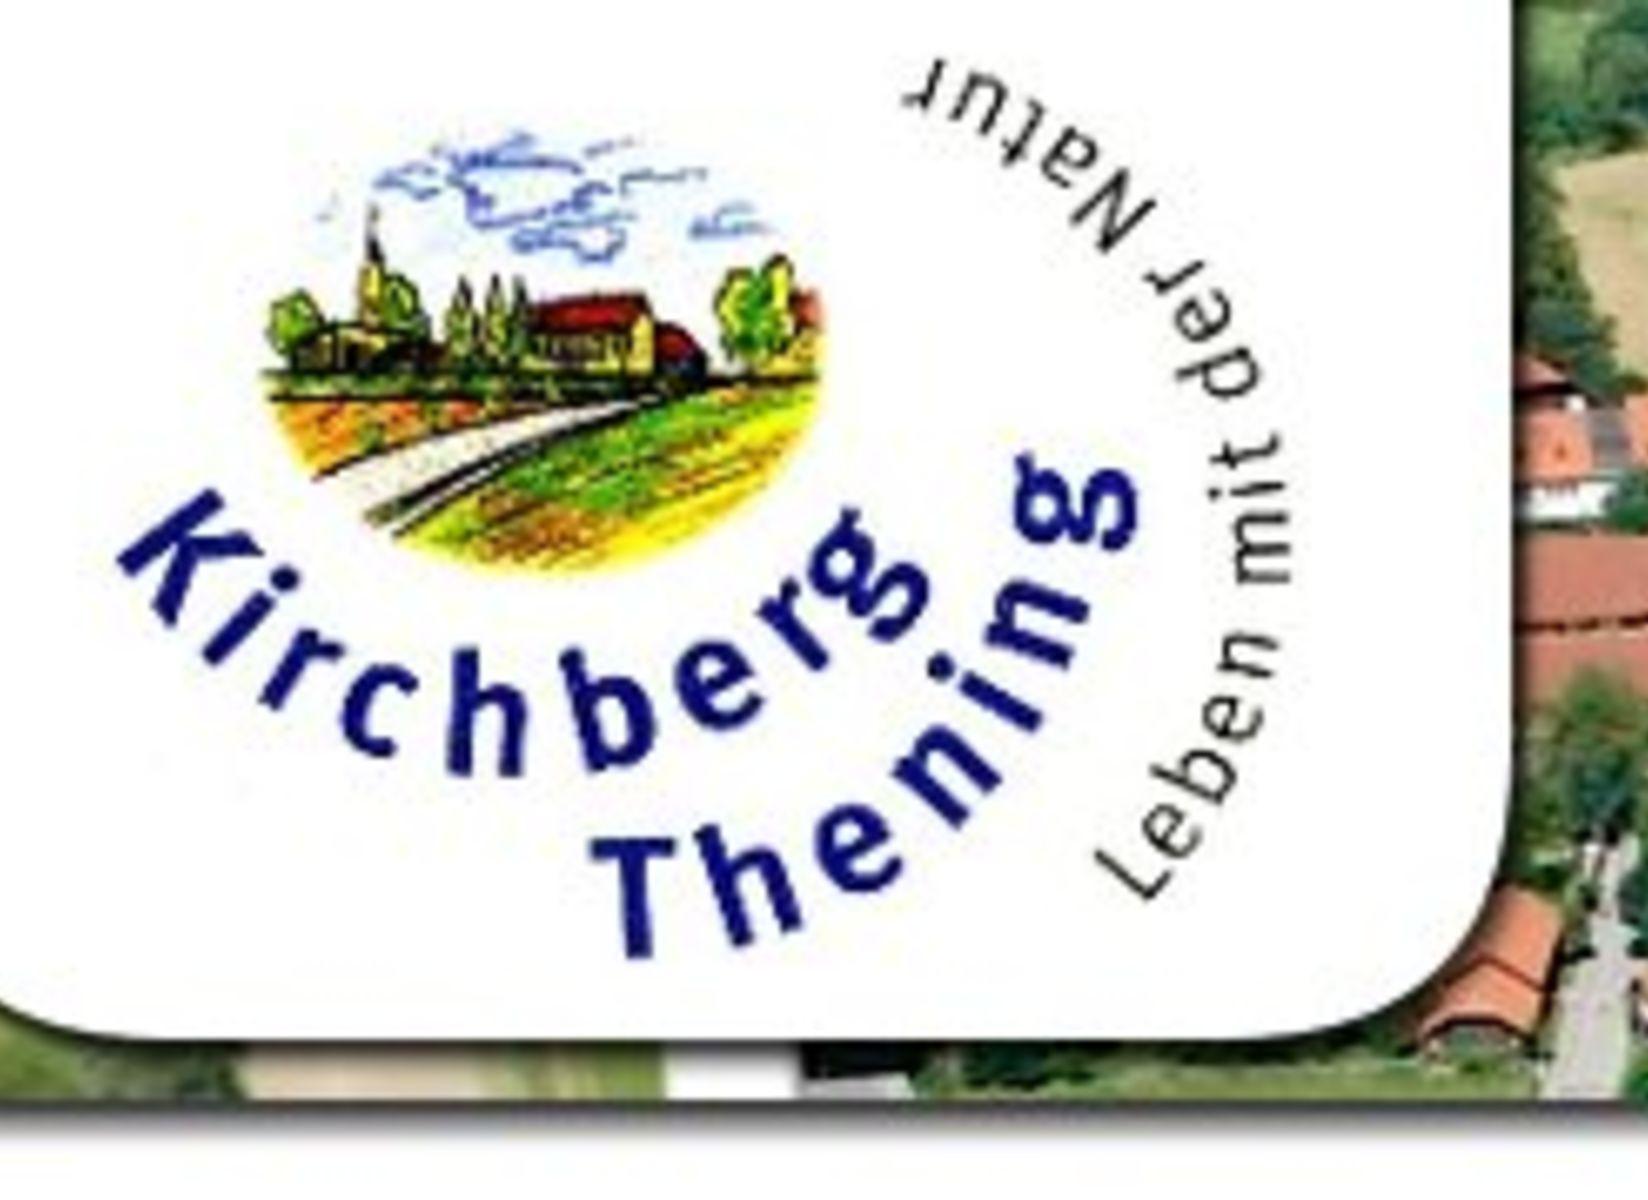 Kirchberg an der raab single dating Kirchberg-thening partnersuche